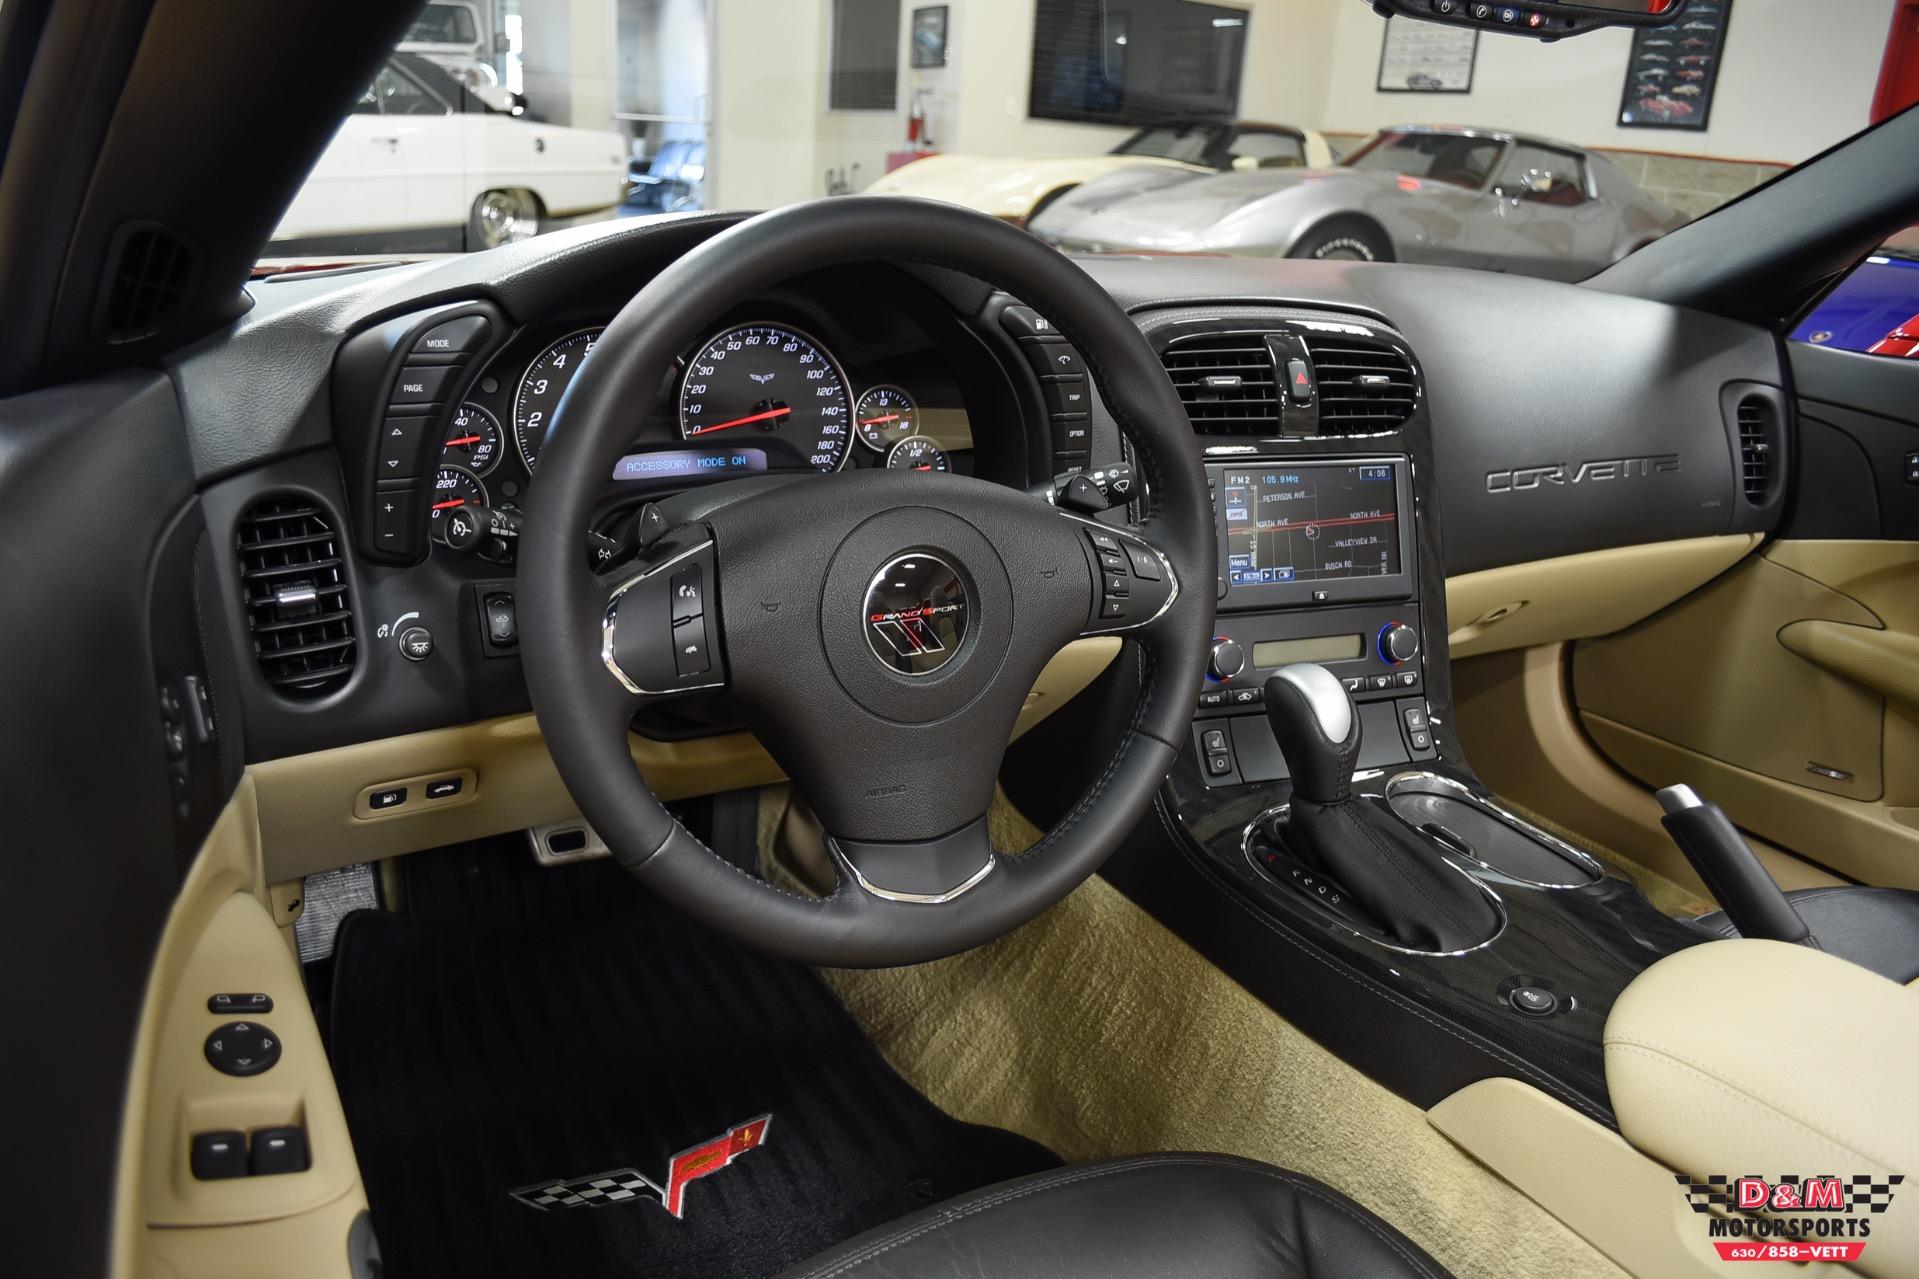 Used 2012 Chevrolet Corvette Grand Sport Convertible   Glen Ellyn, IL